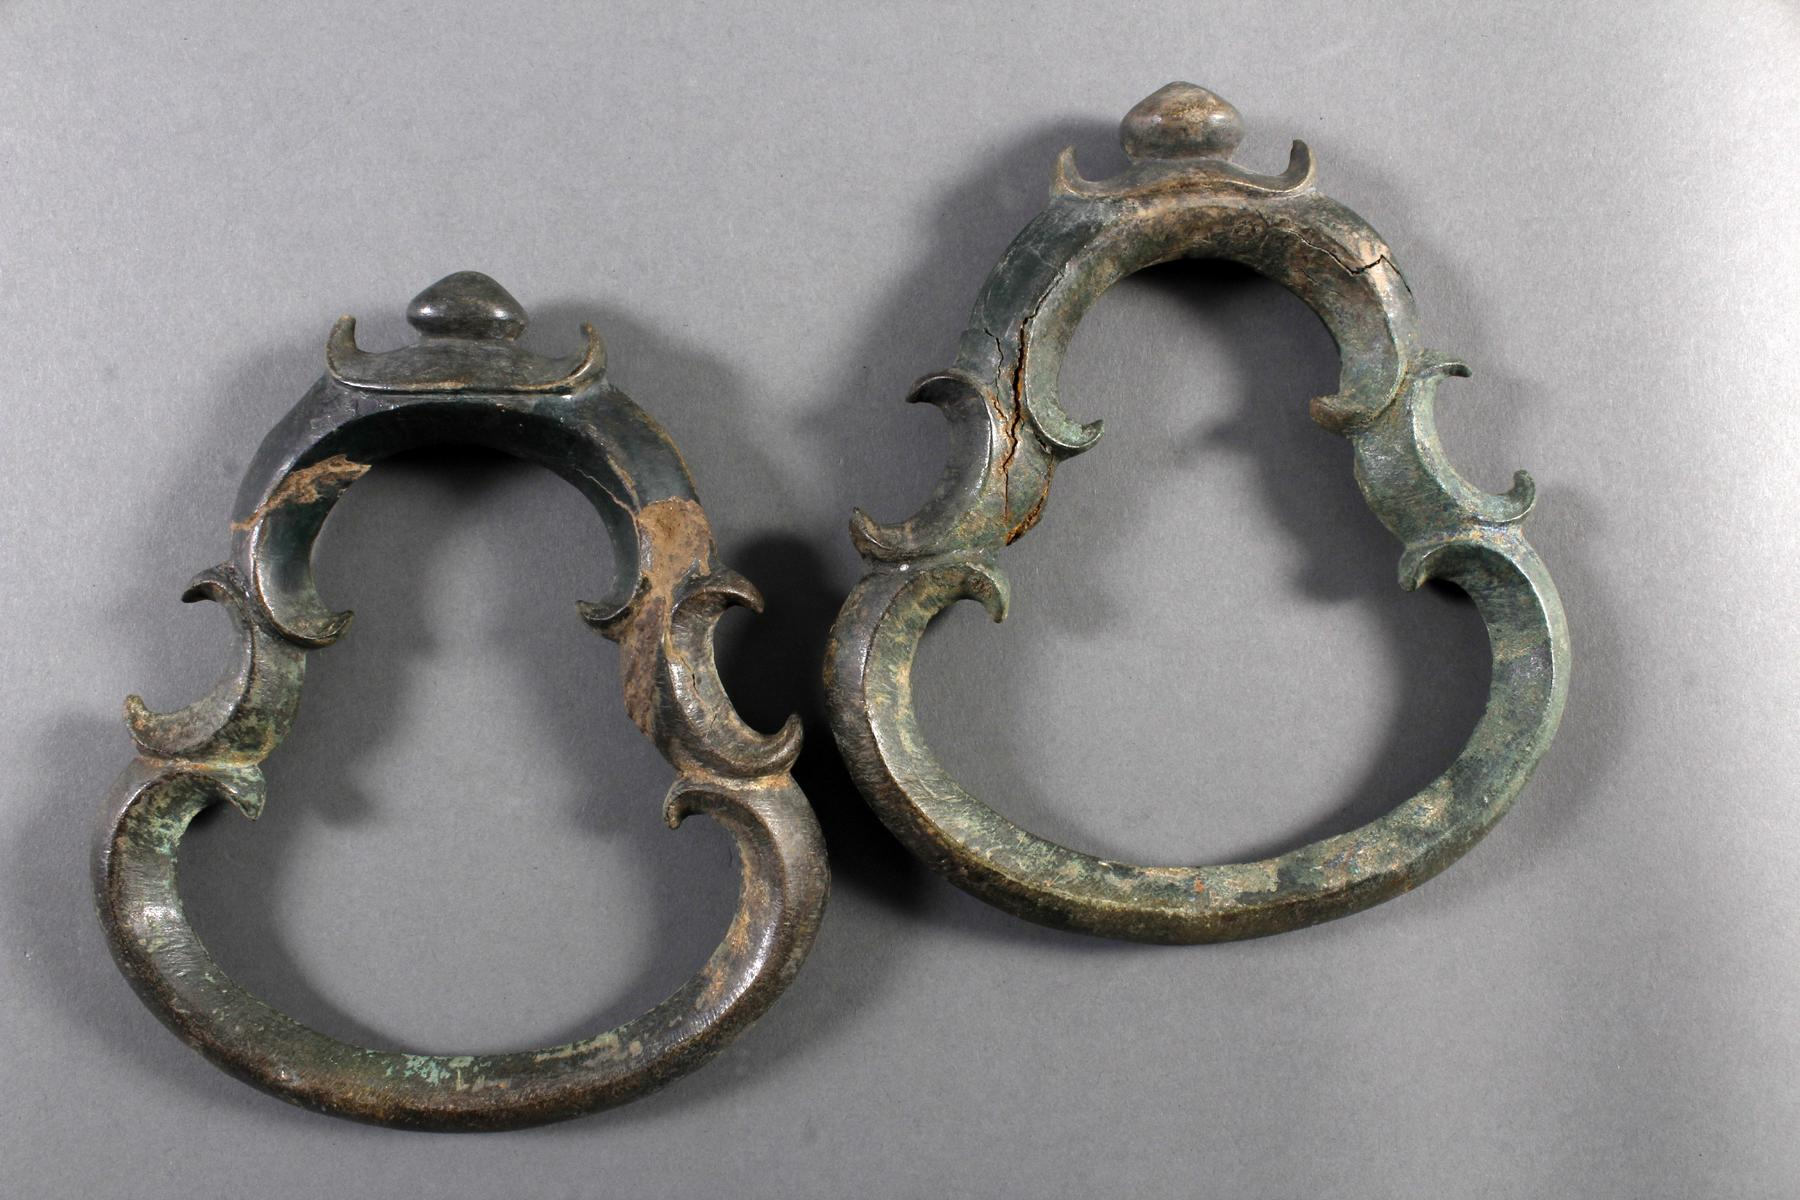 2 Glücksbringersymbole aus Bronze, Angkor 12./13. Jahrhunder